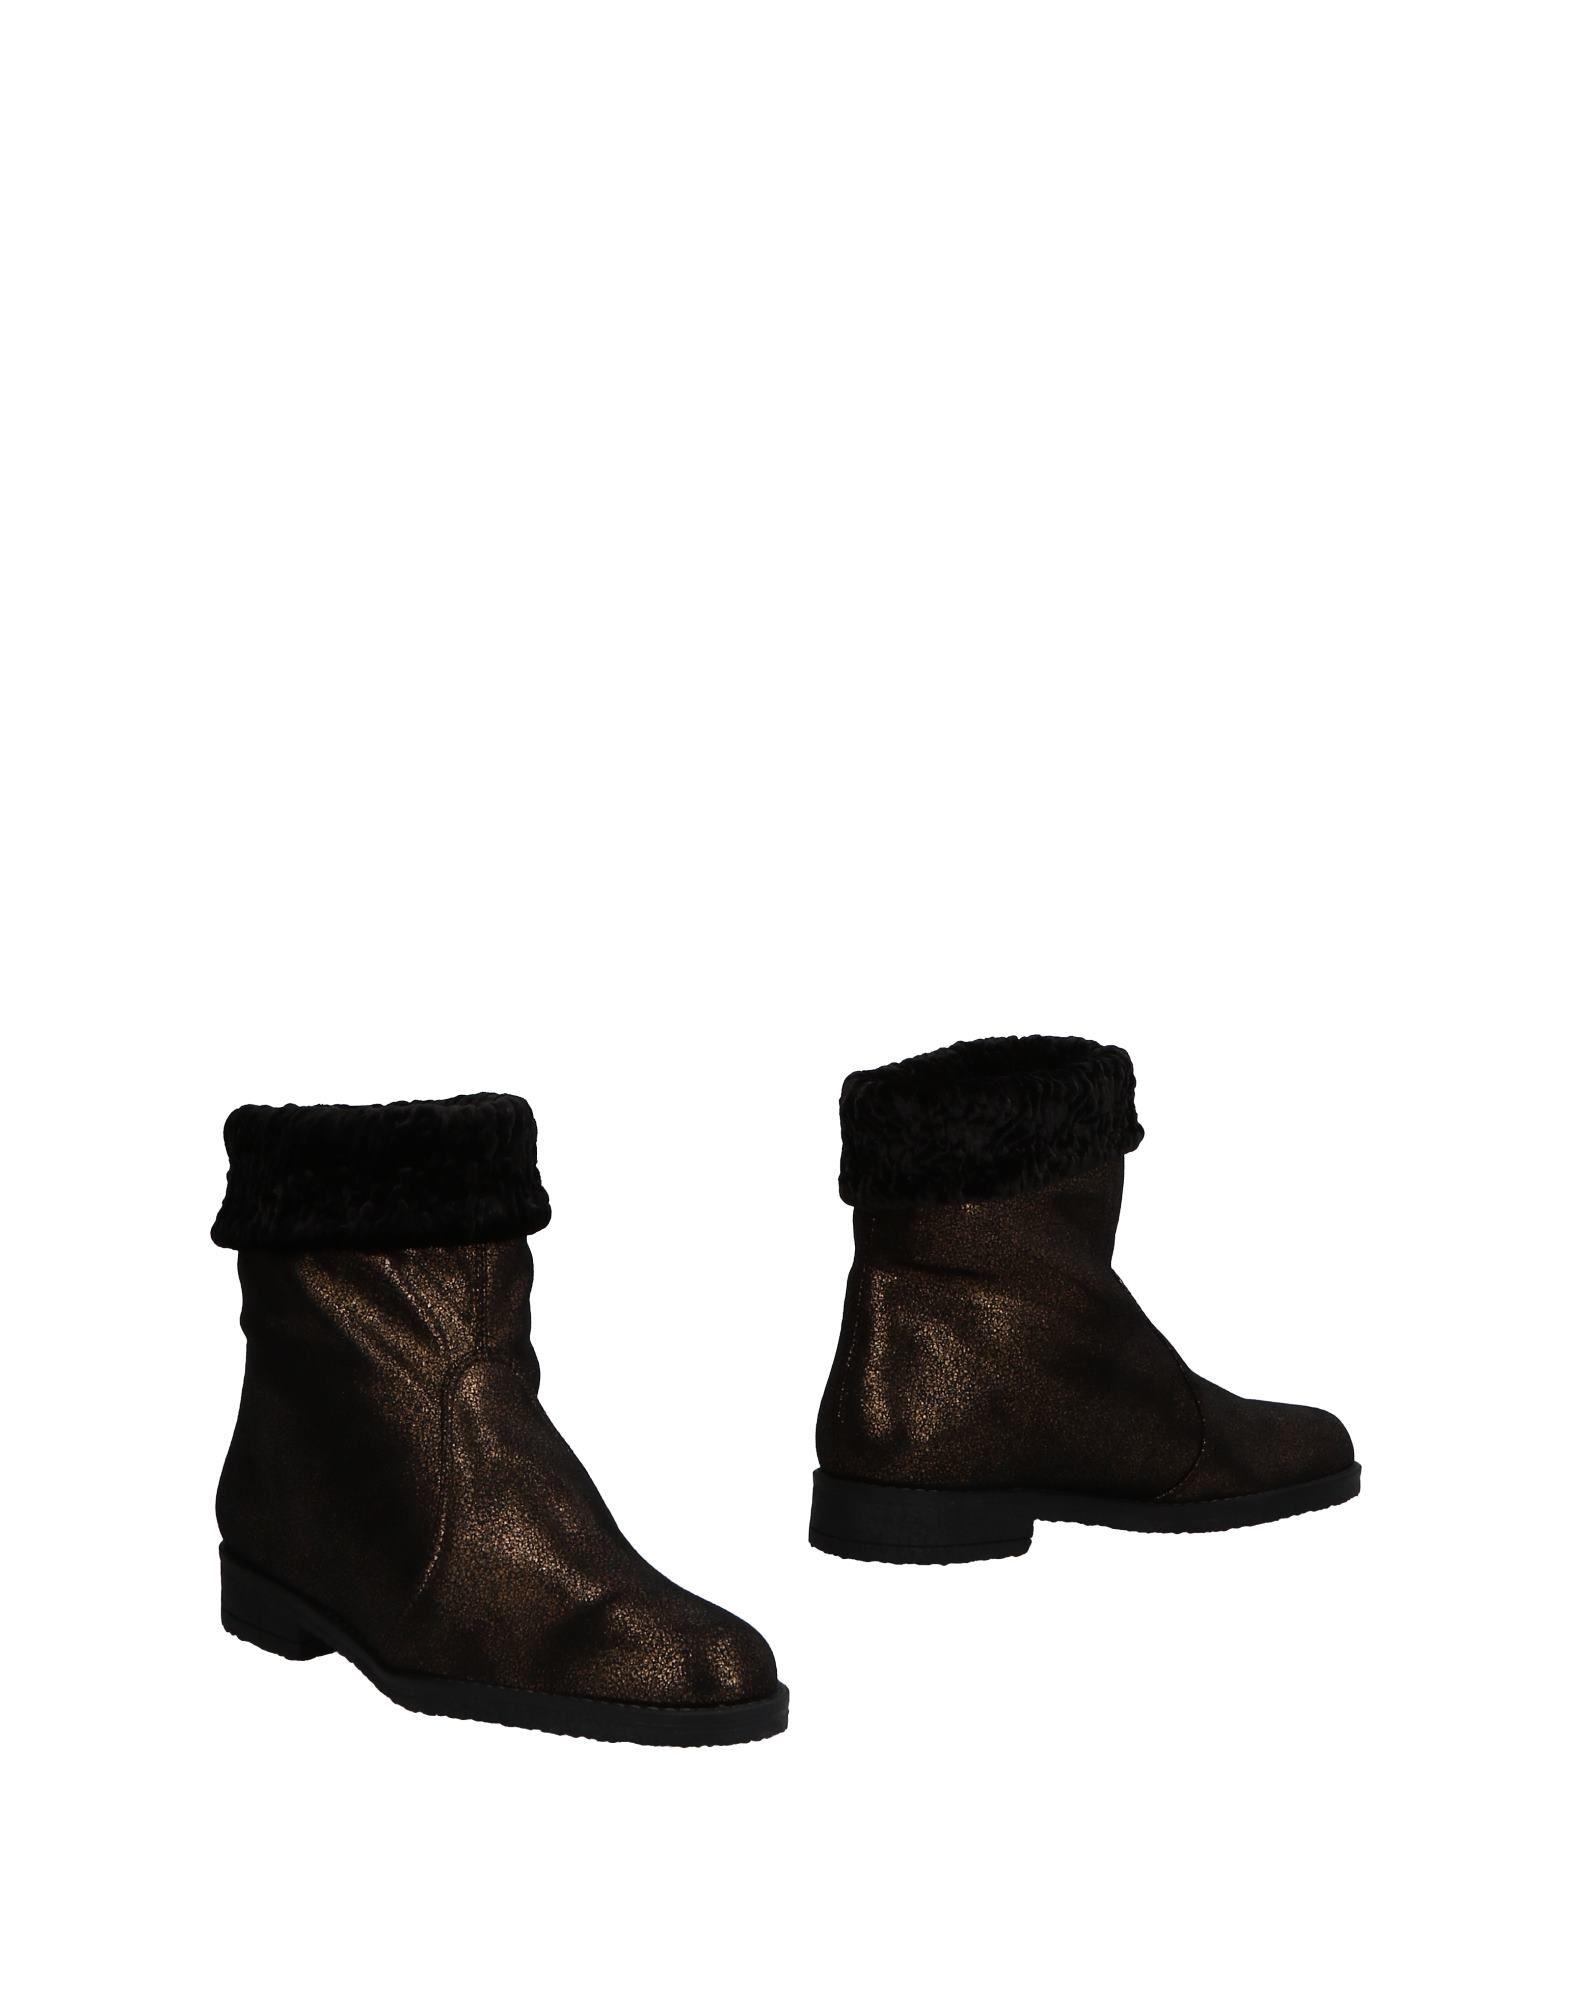 Bottine Nr Rapisardi Femme - Bottines Nr Rapisardi Bronze Chaussures casual sauvages